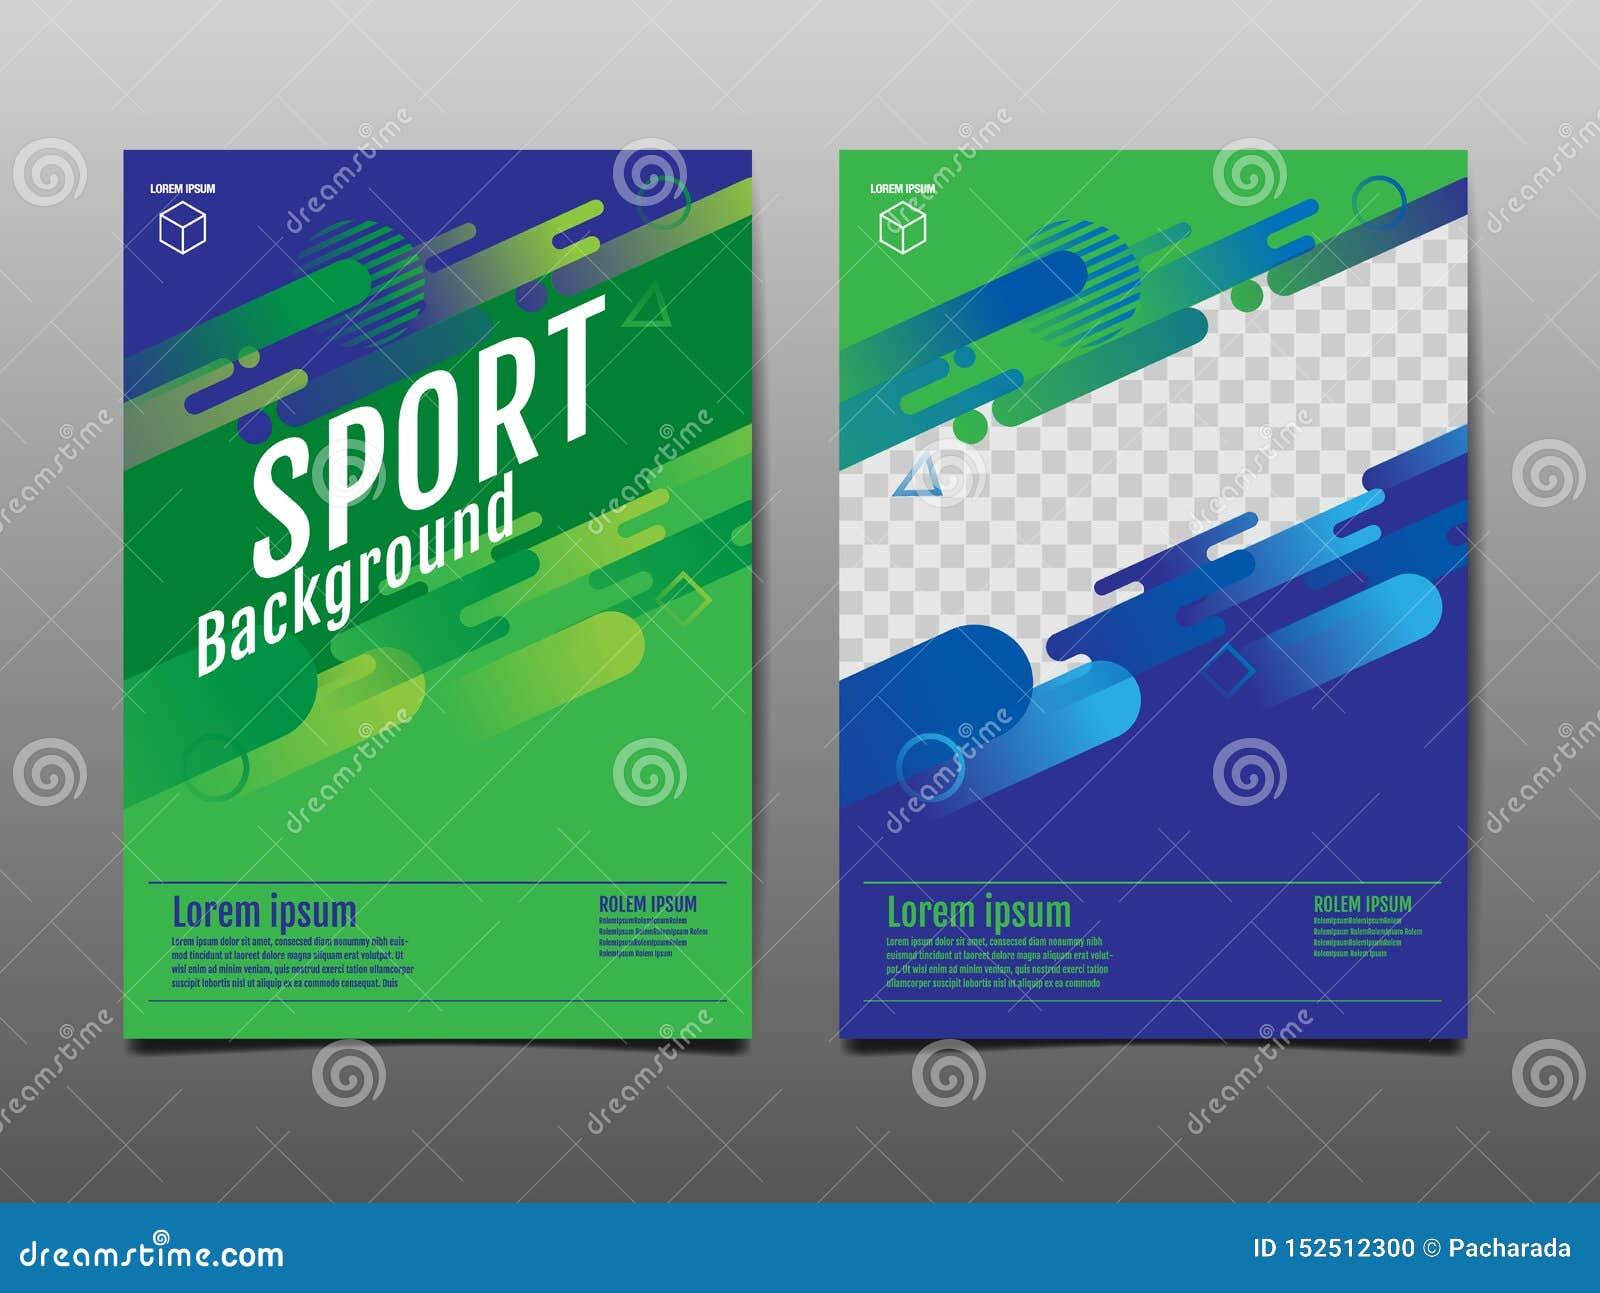 Layout template Design, Sport Background, Dynamic Poster, Banner, Vector Illustration